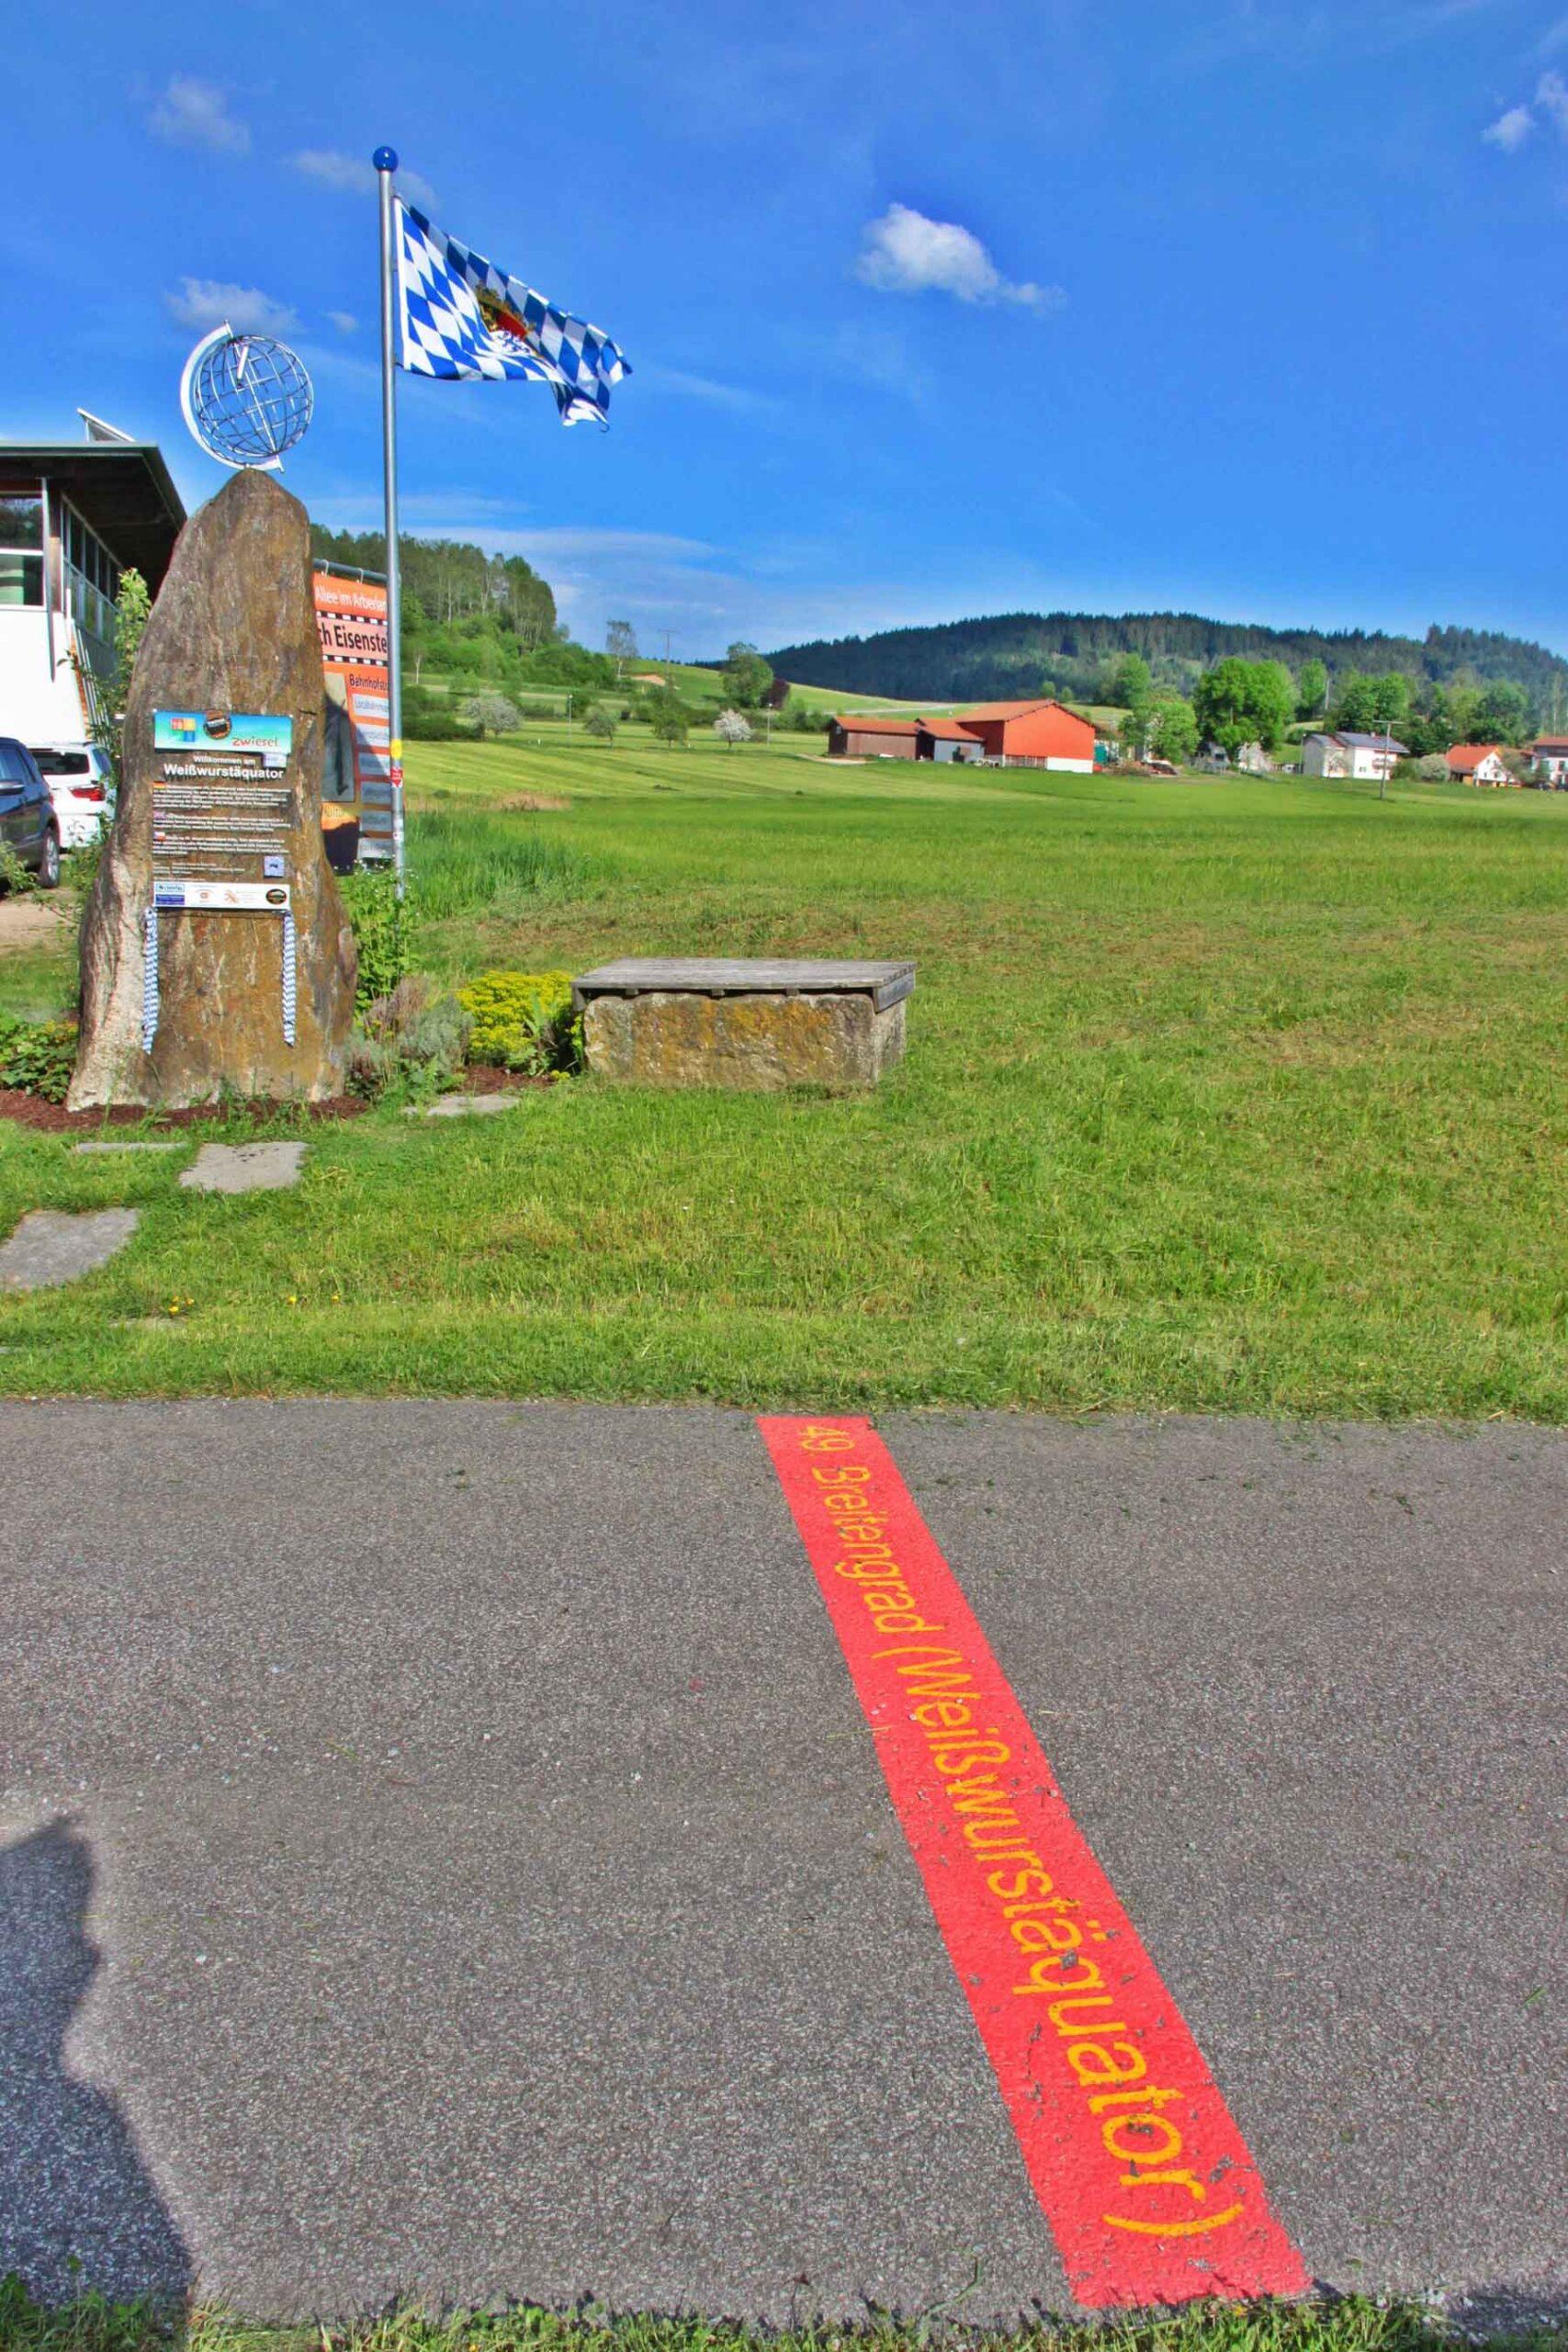 Weißwurst sausage equator monument, 49th degree of latitude in Zwiesel, North Bavaria